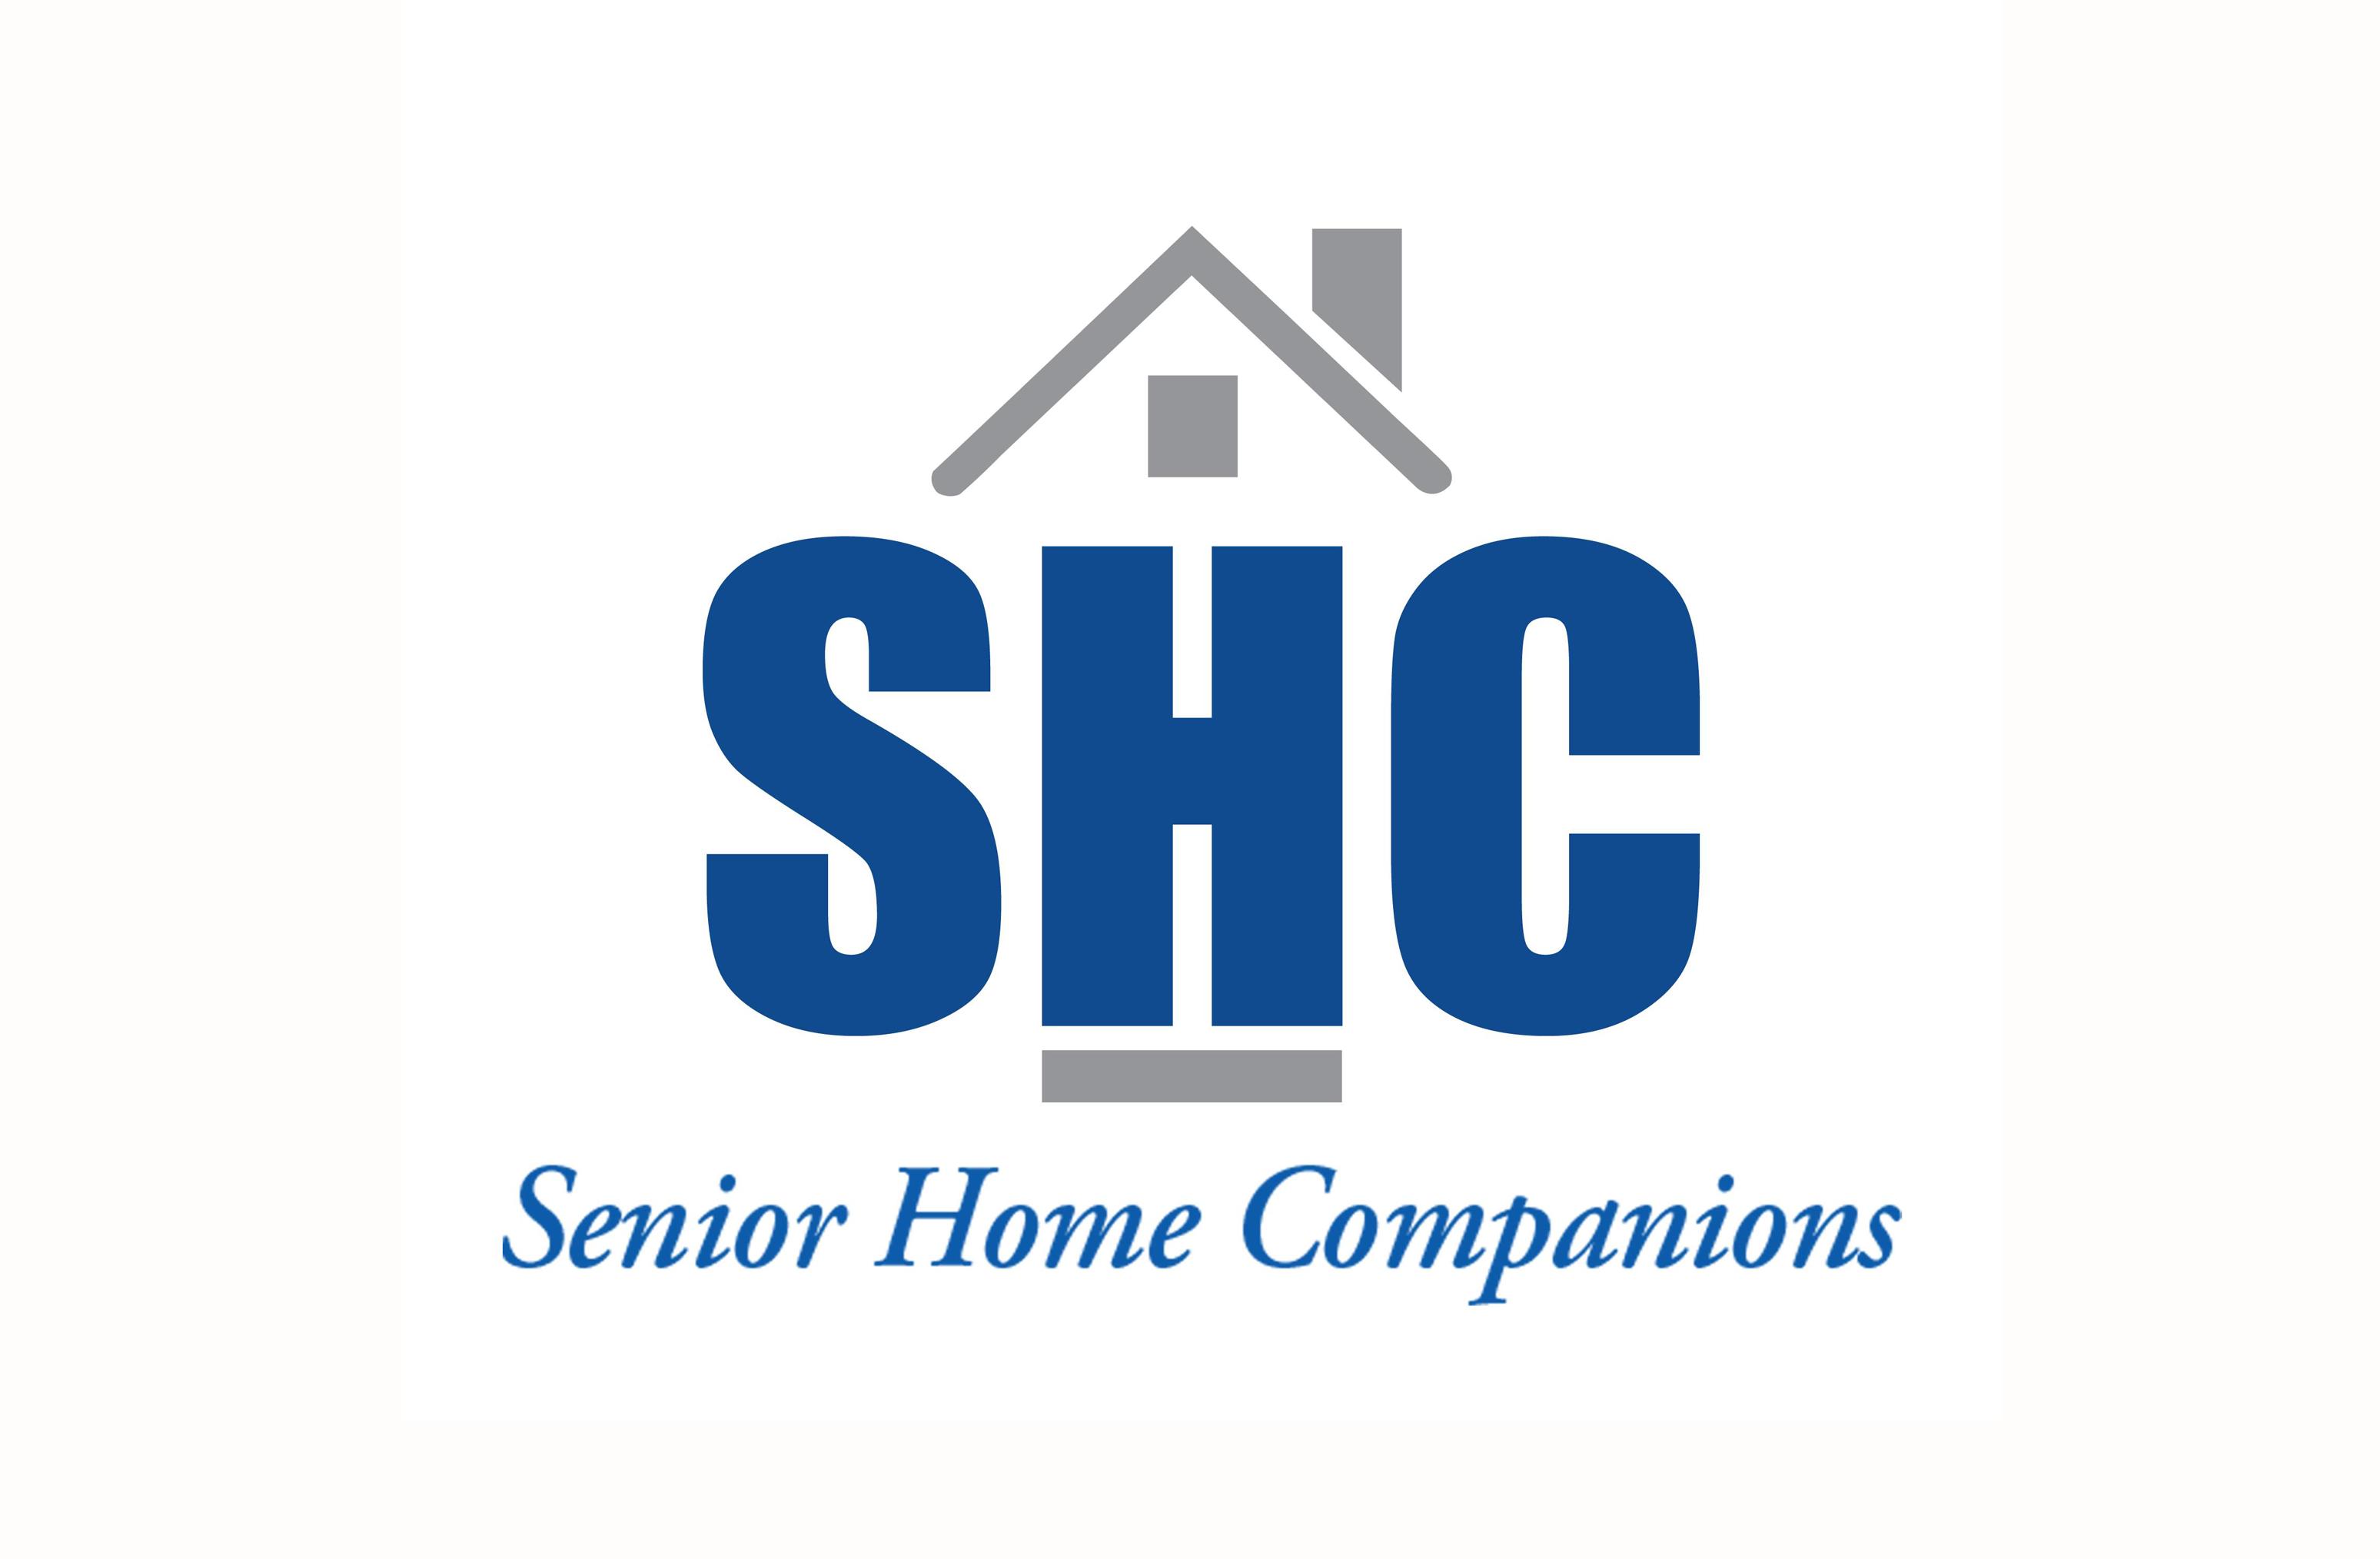 Senior Home Companions Inc